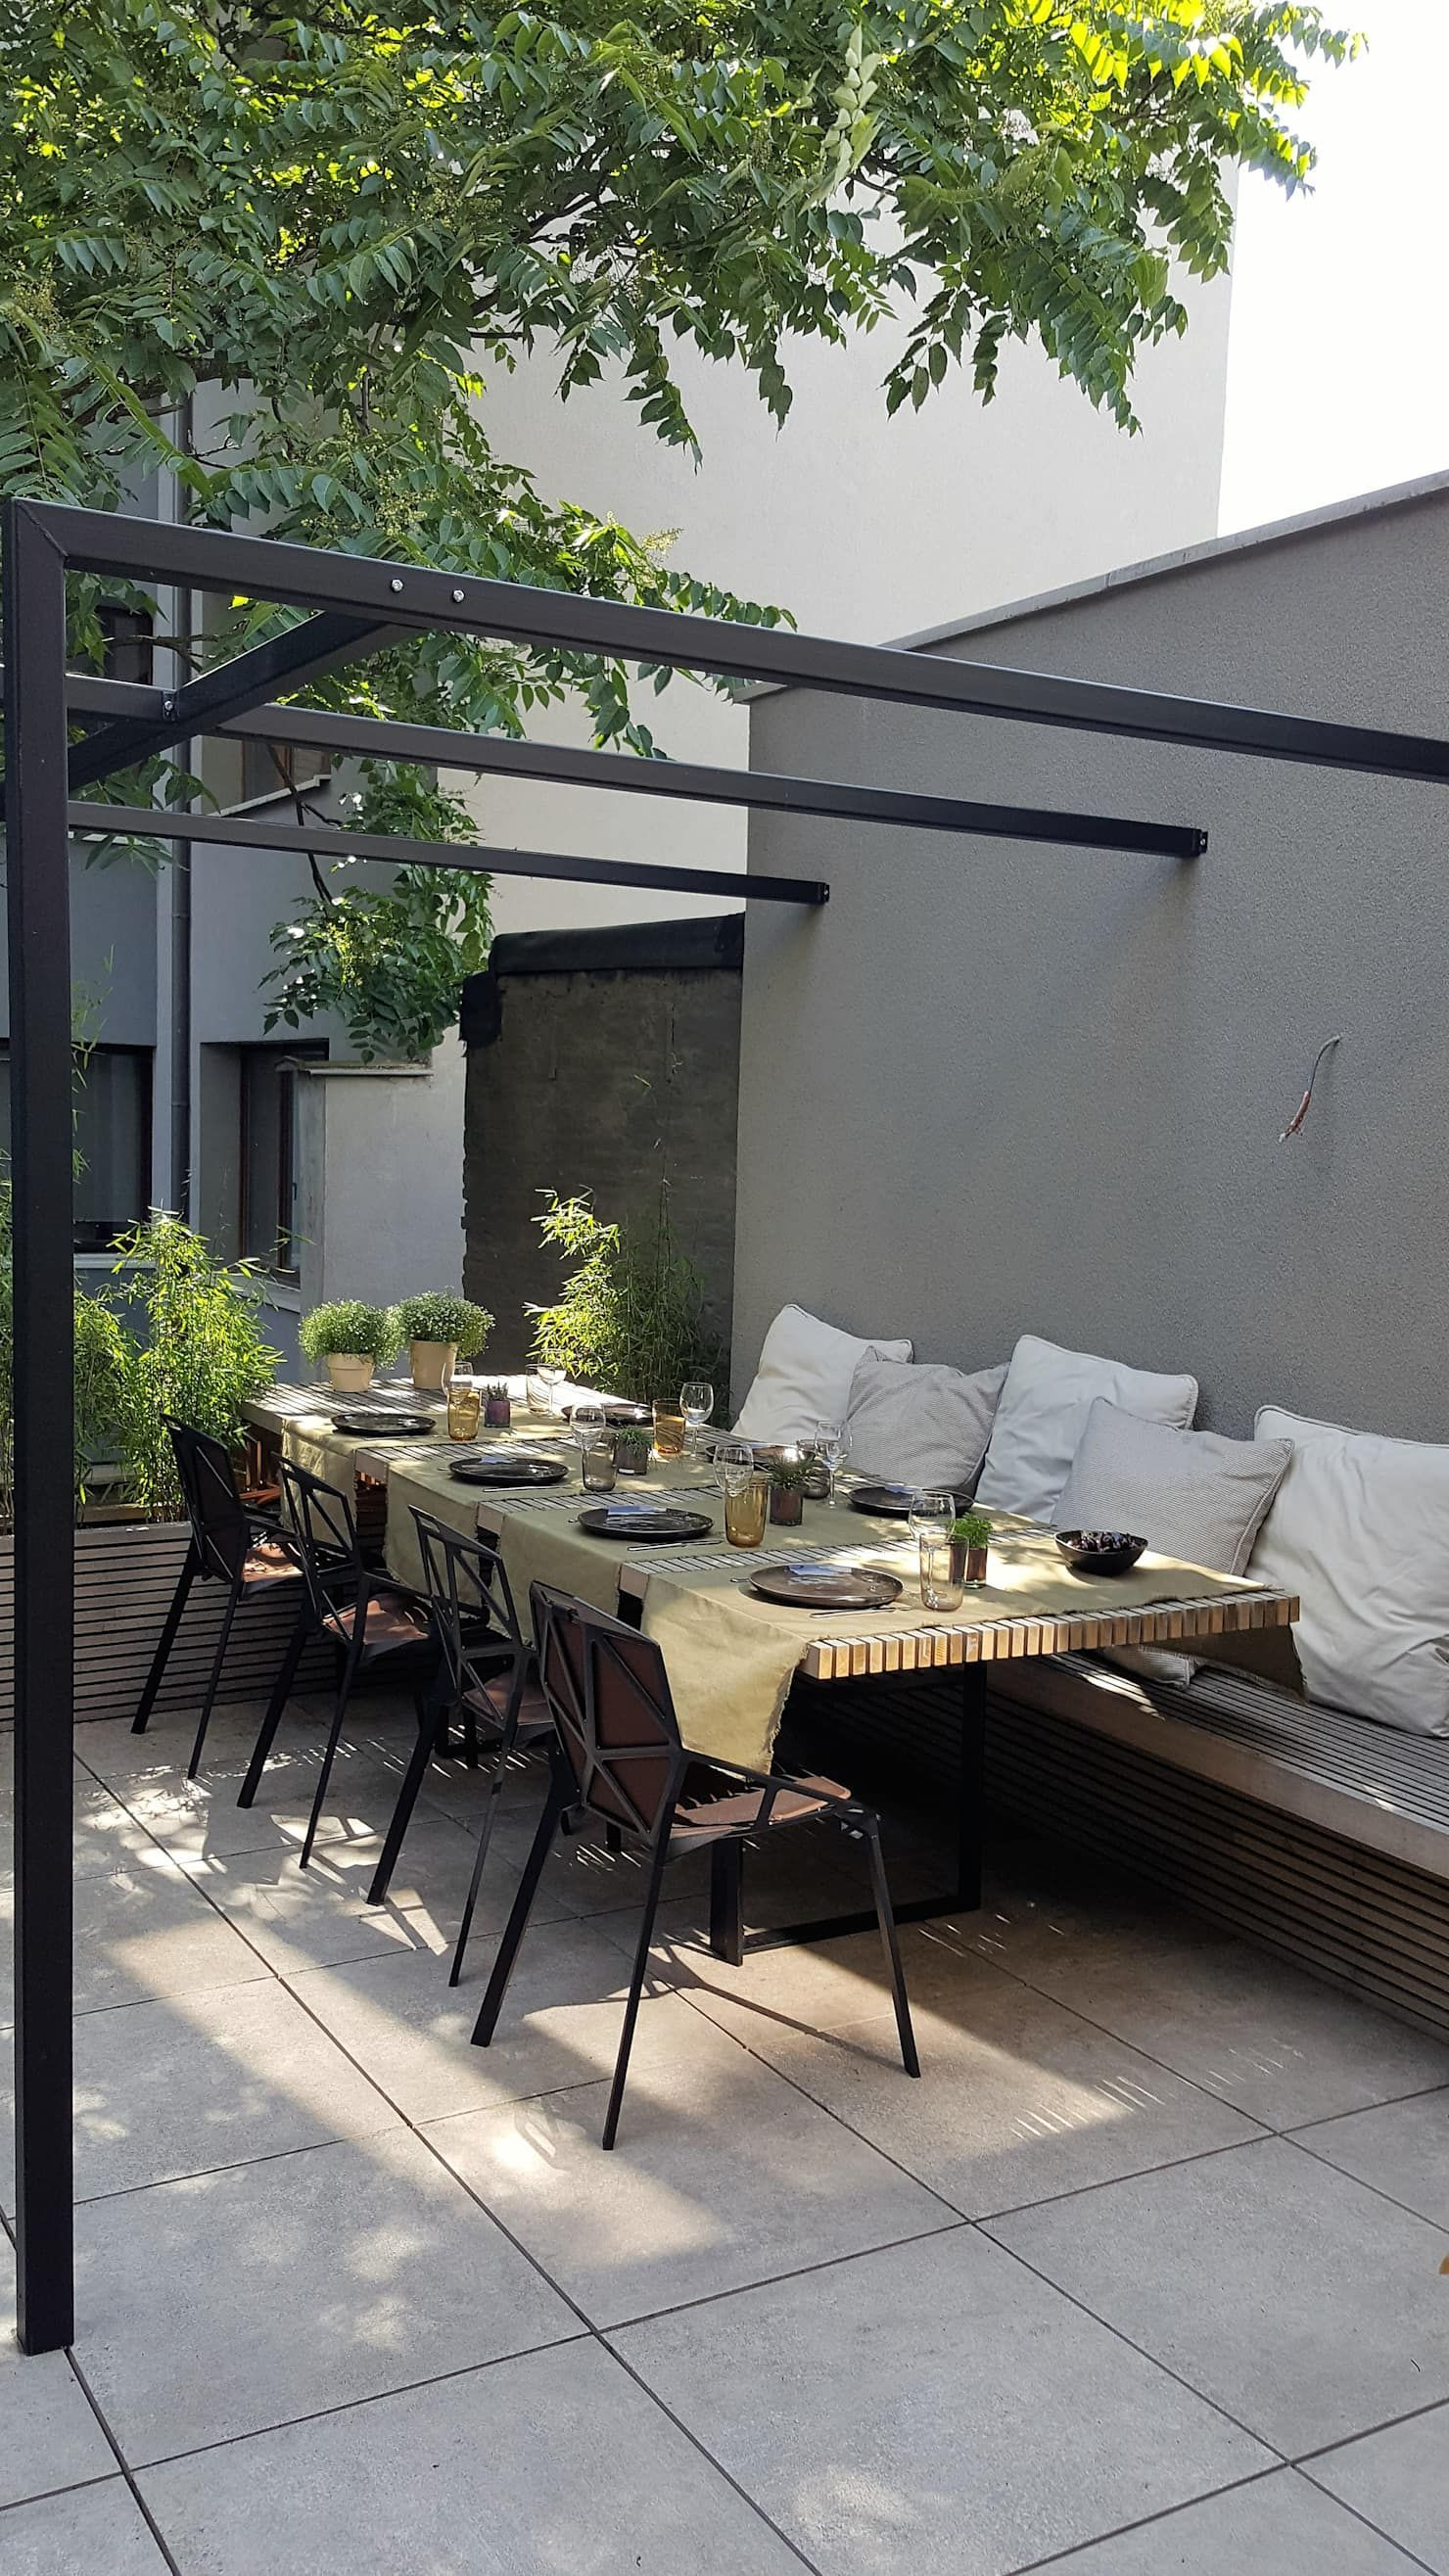 Photo of Neues Konzept Stadtterrassen minimalistische Balkone, Veranda en terrassen van lento Innenräume minimalistisch | homifizieren